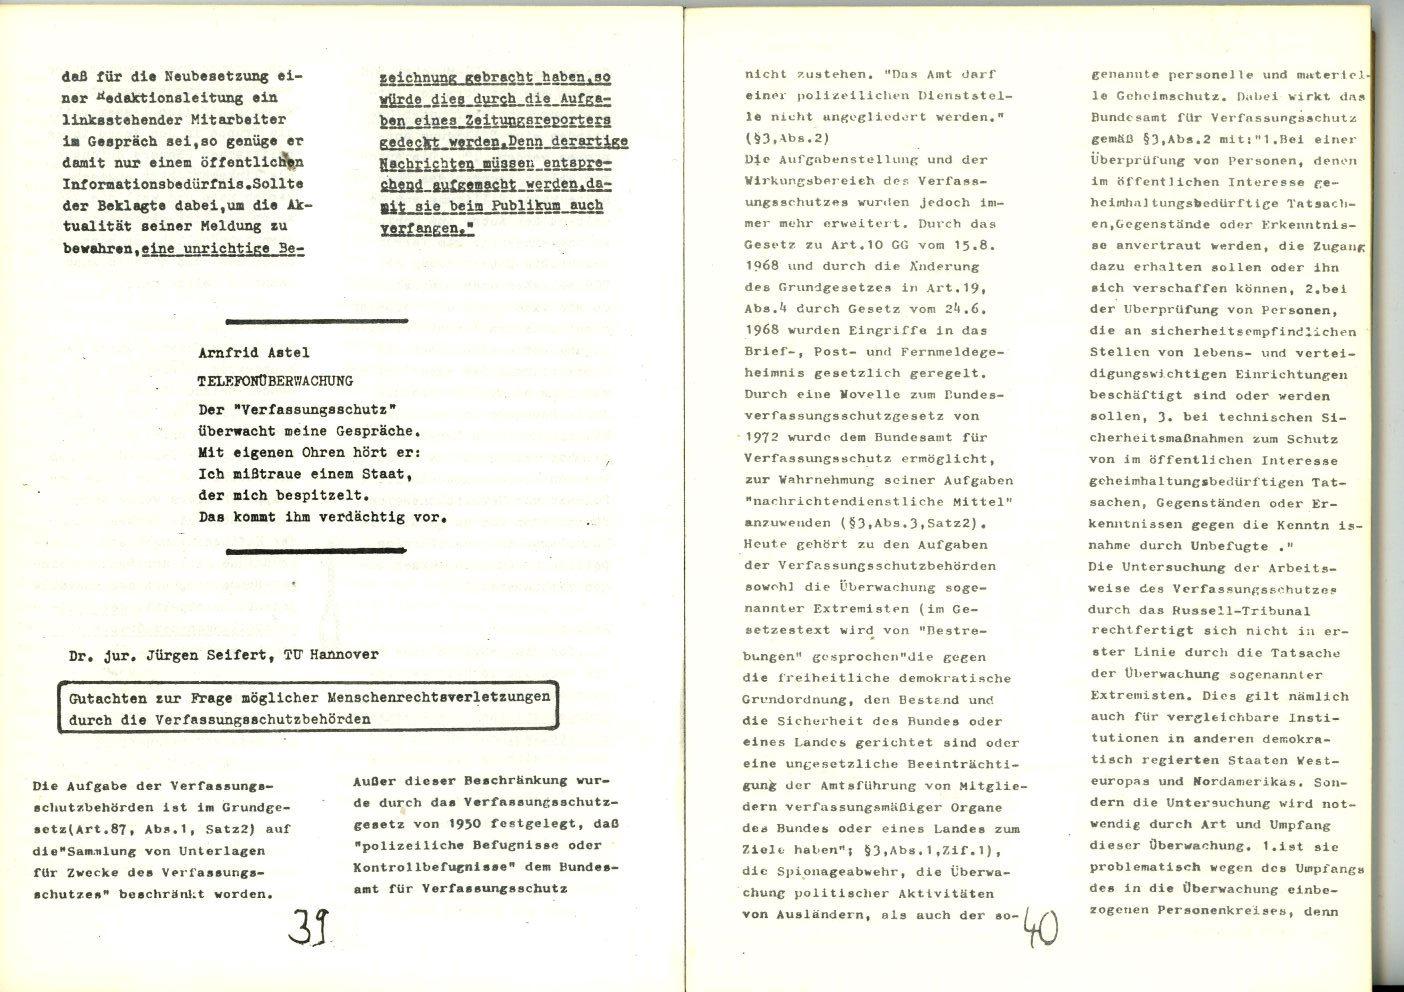 Marburg_Russell_Initiative_1978_21